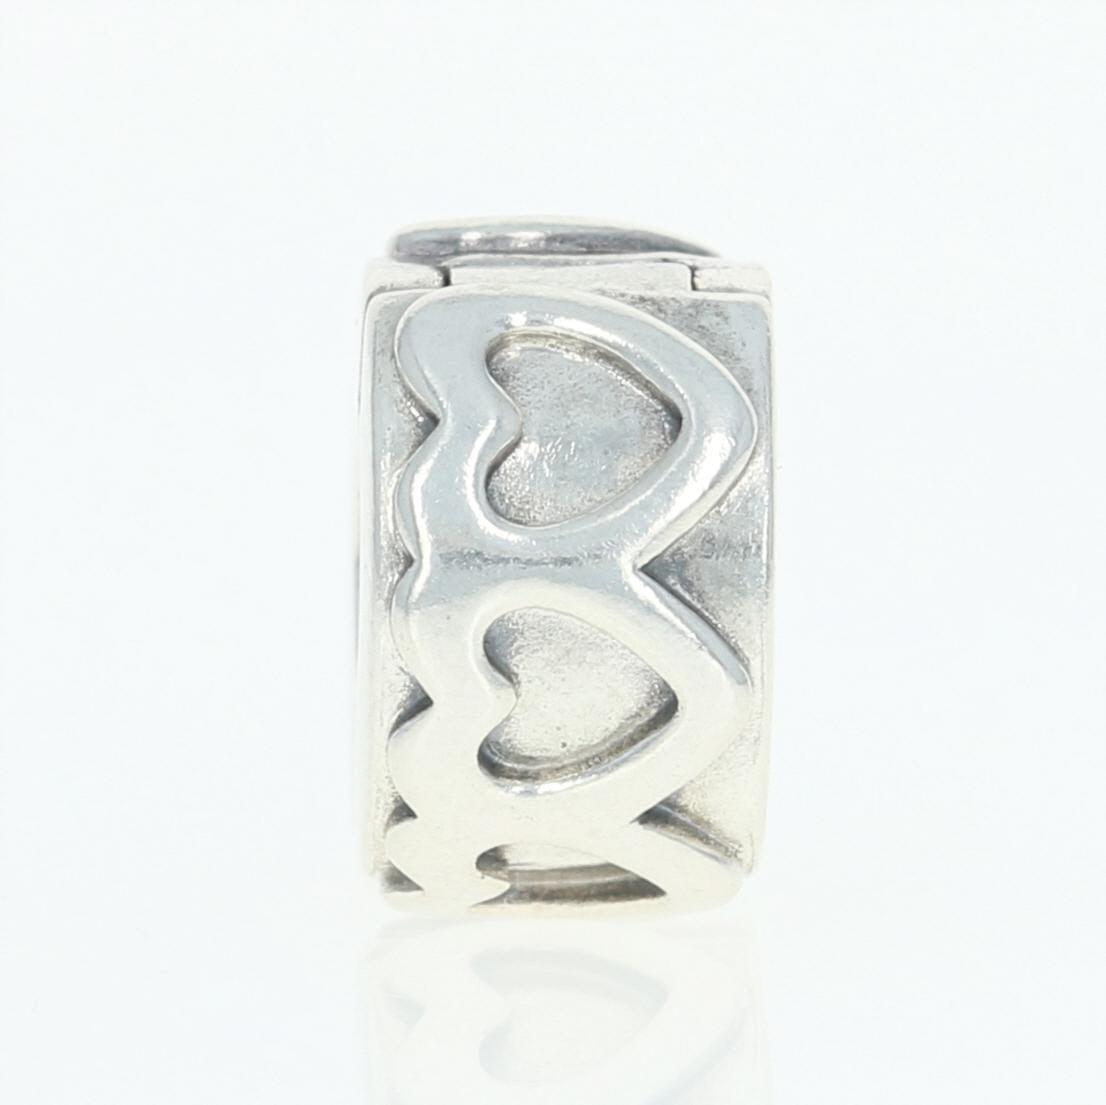 Pandora 791978 Women's Charm 925 Silver RJLaIzXZ